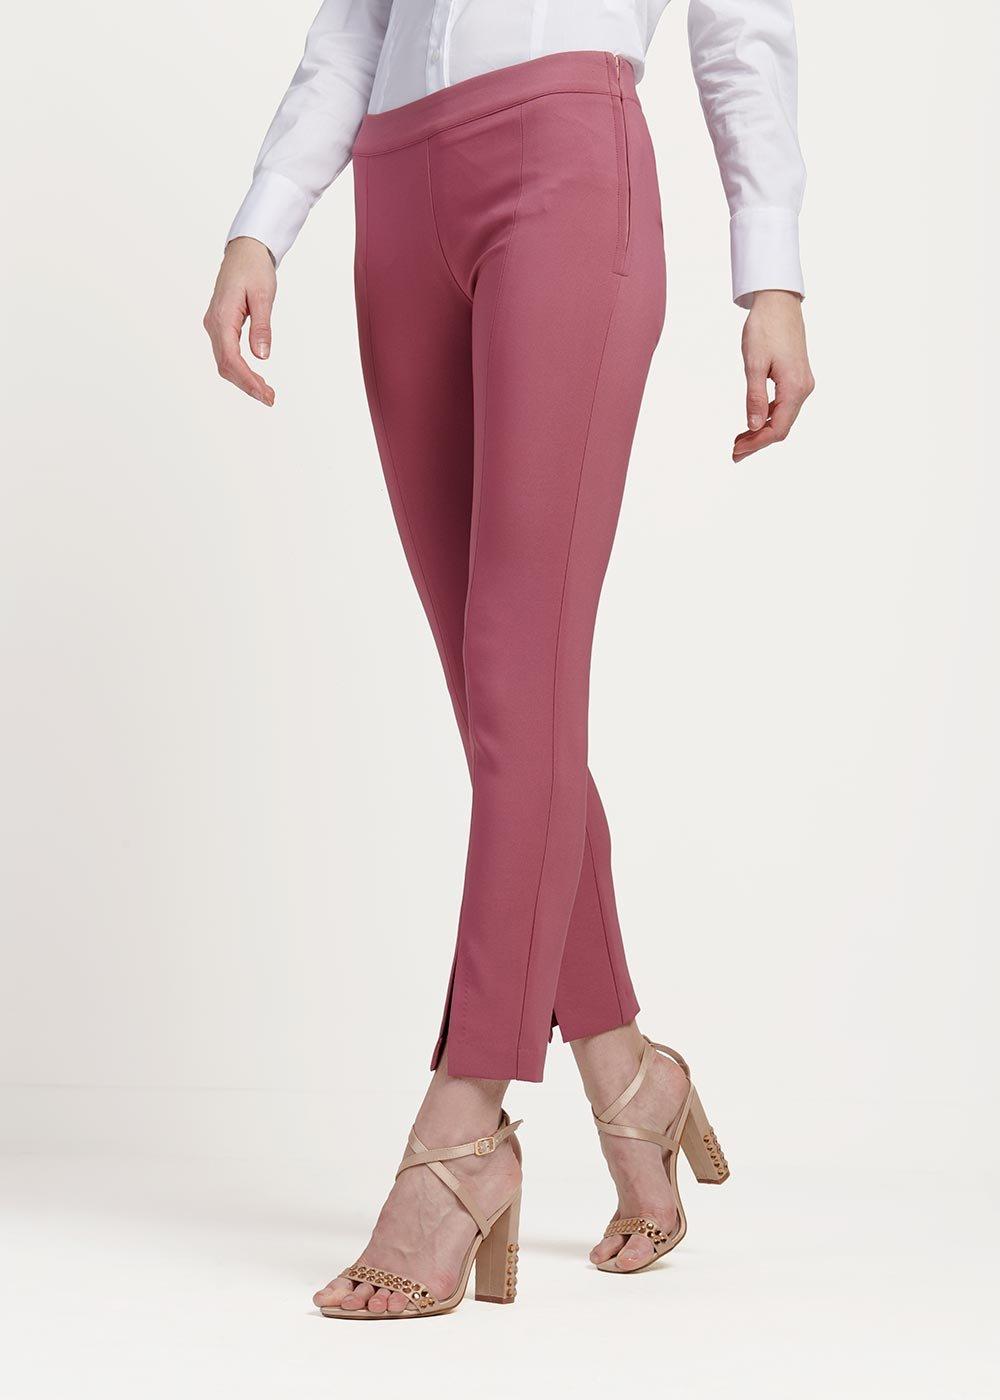 Pantaloni modello Peleo colore candy - Candy - Donna